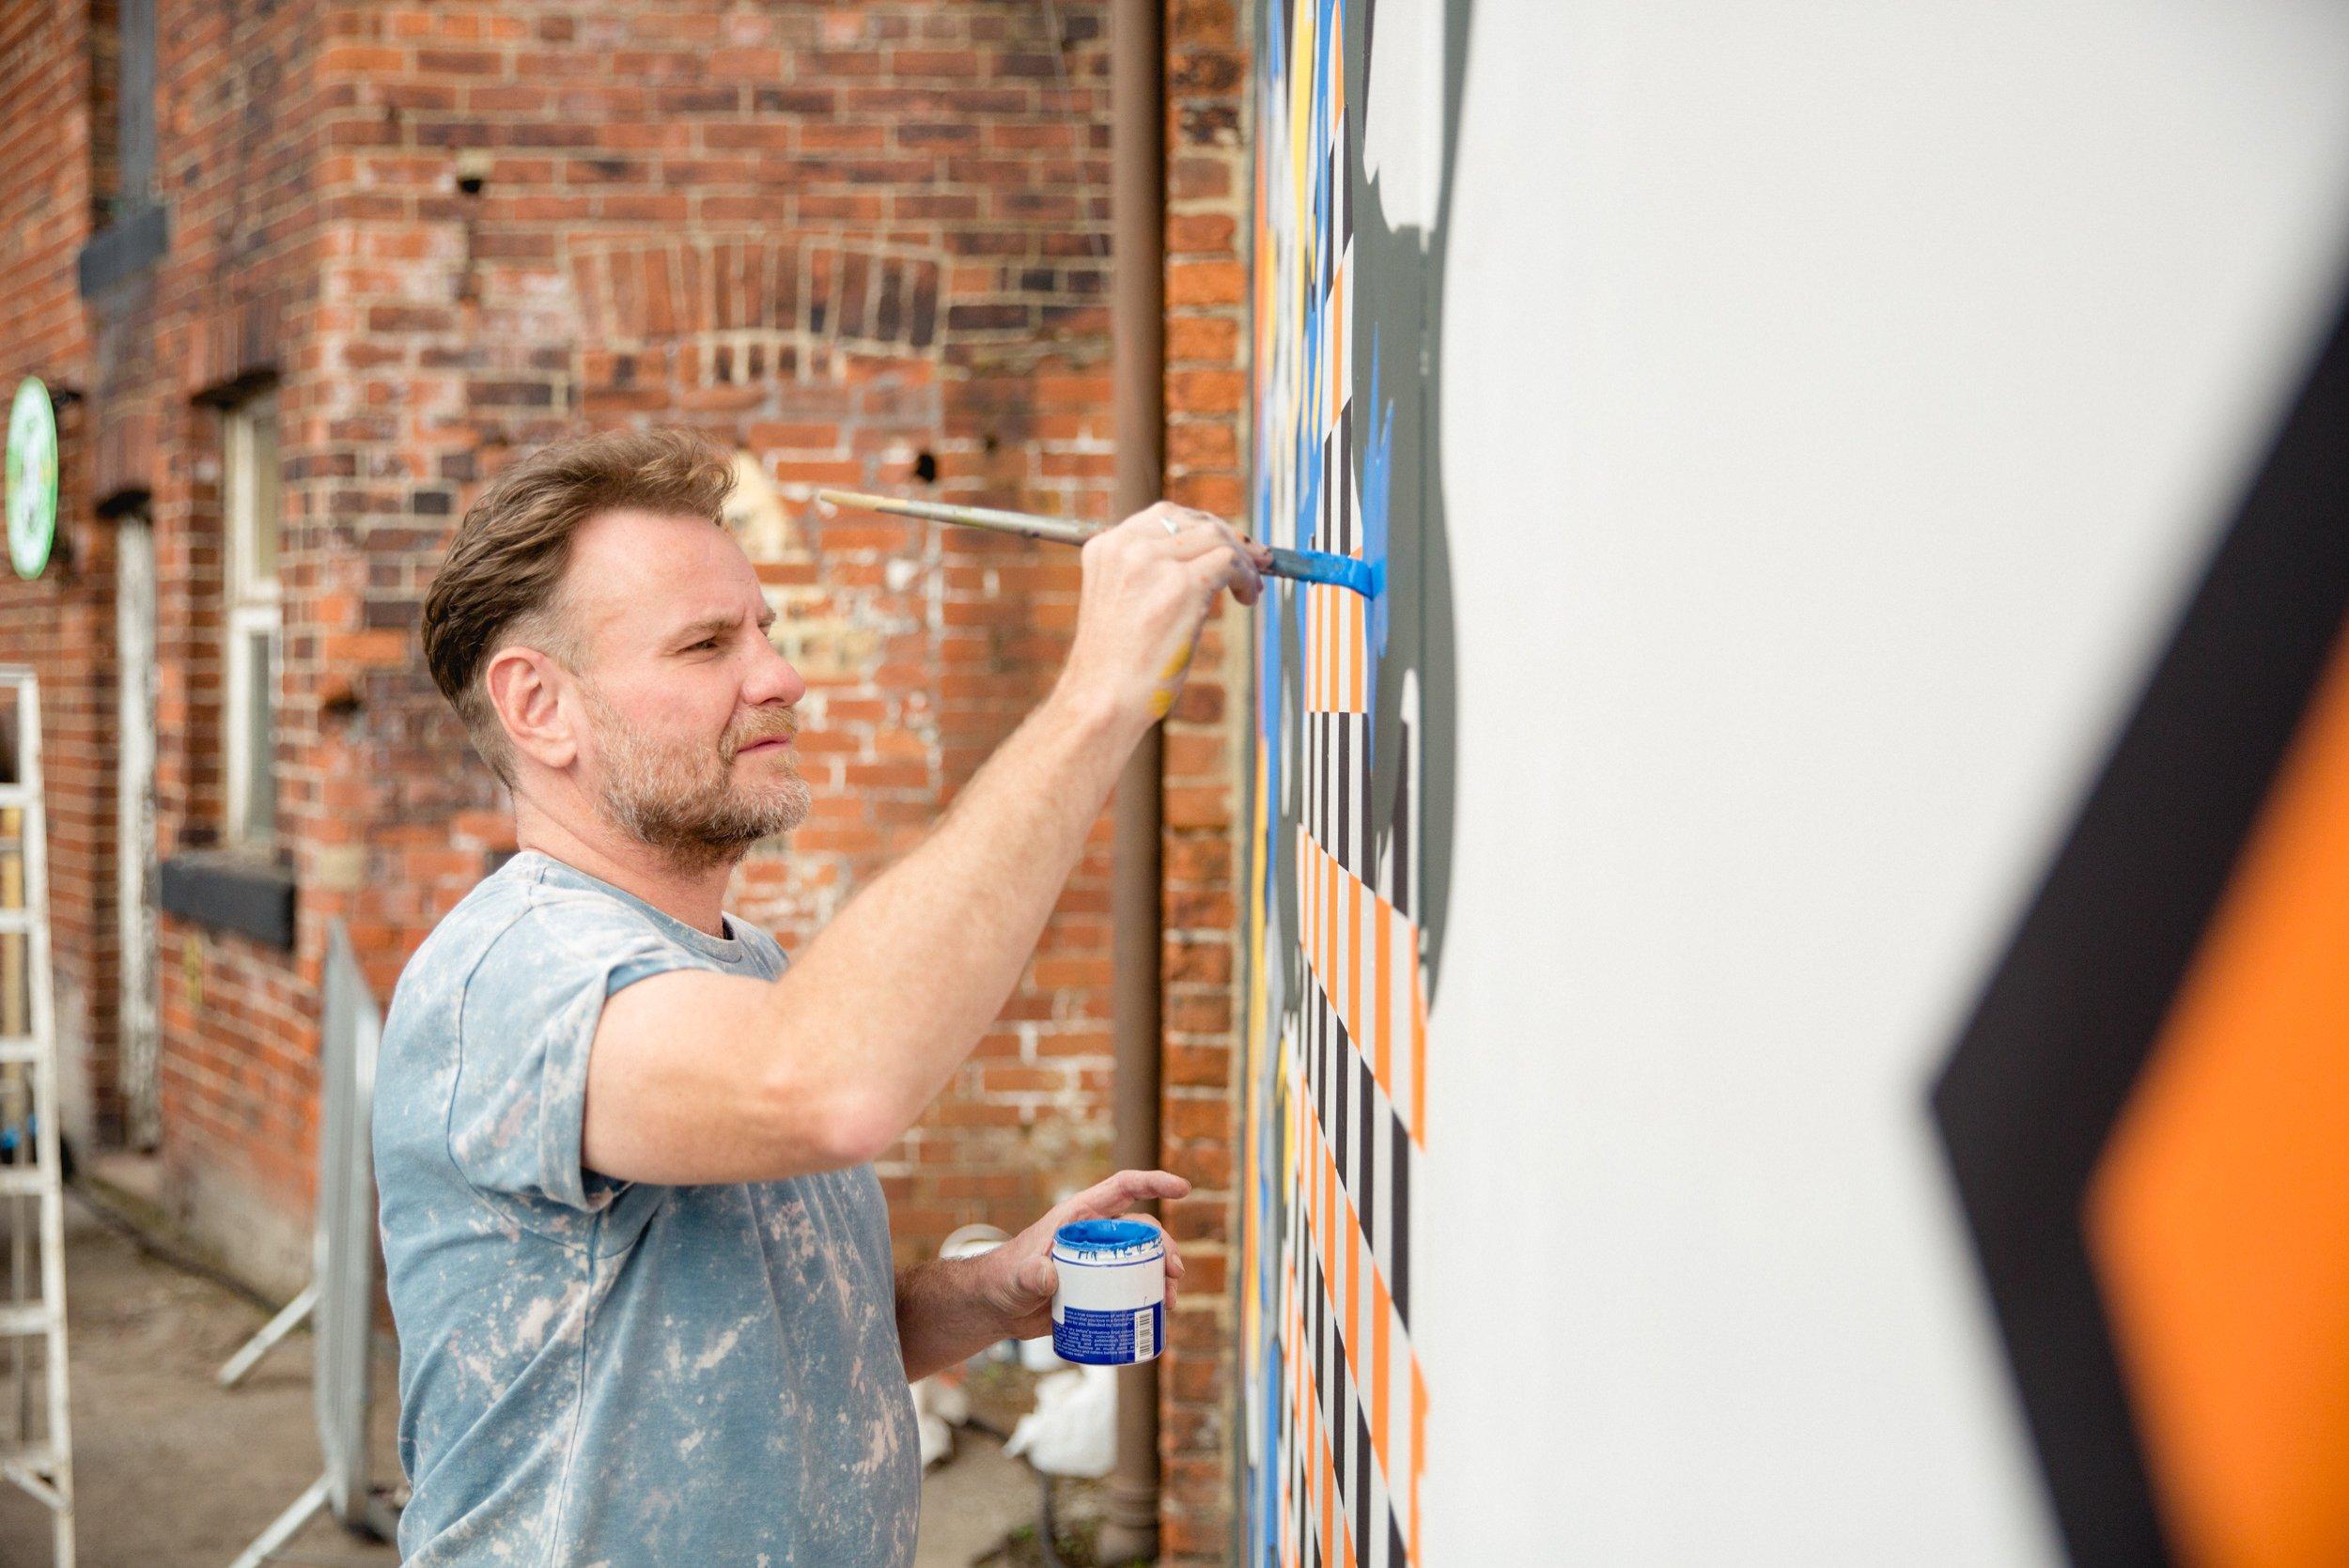 Nicholas Dixon street artist painting at Canal Mills